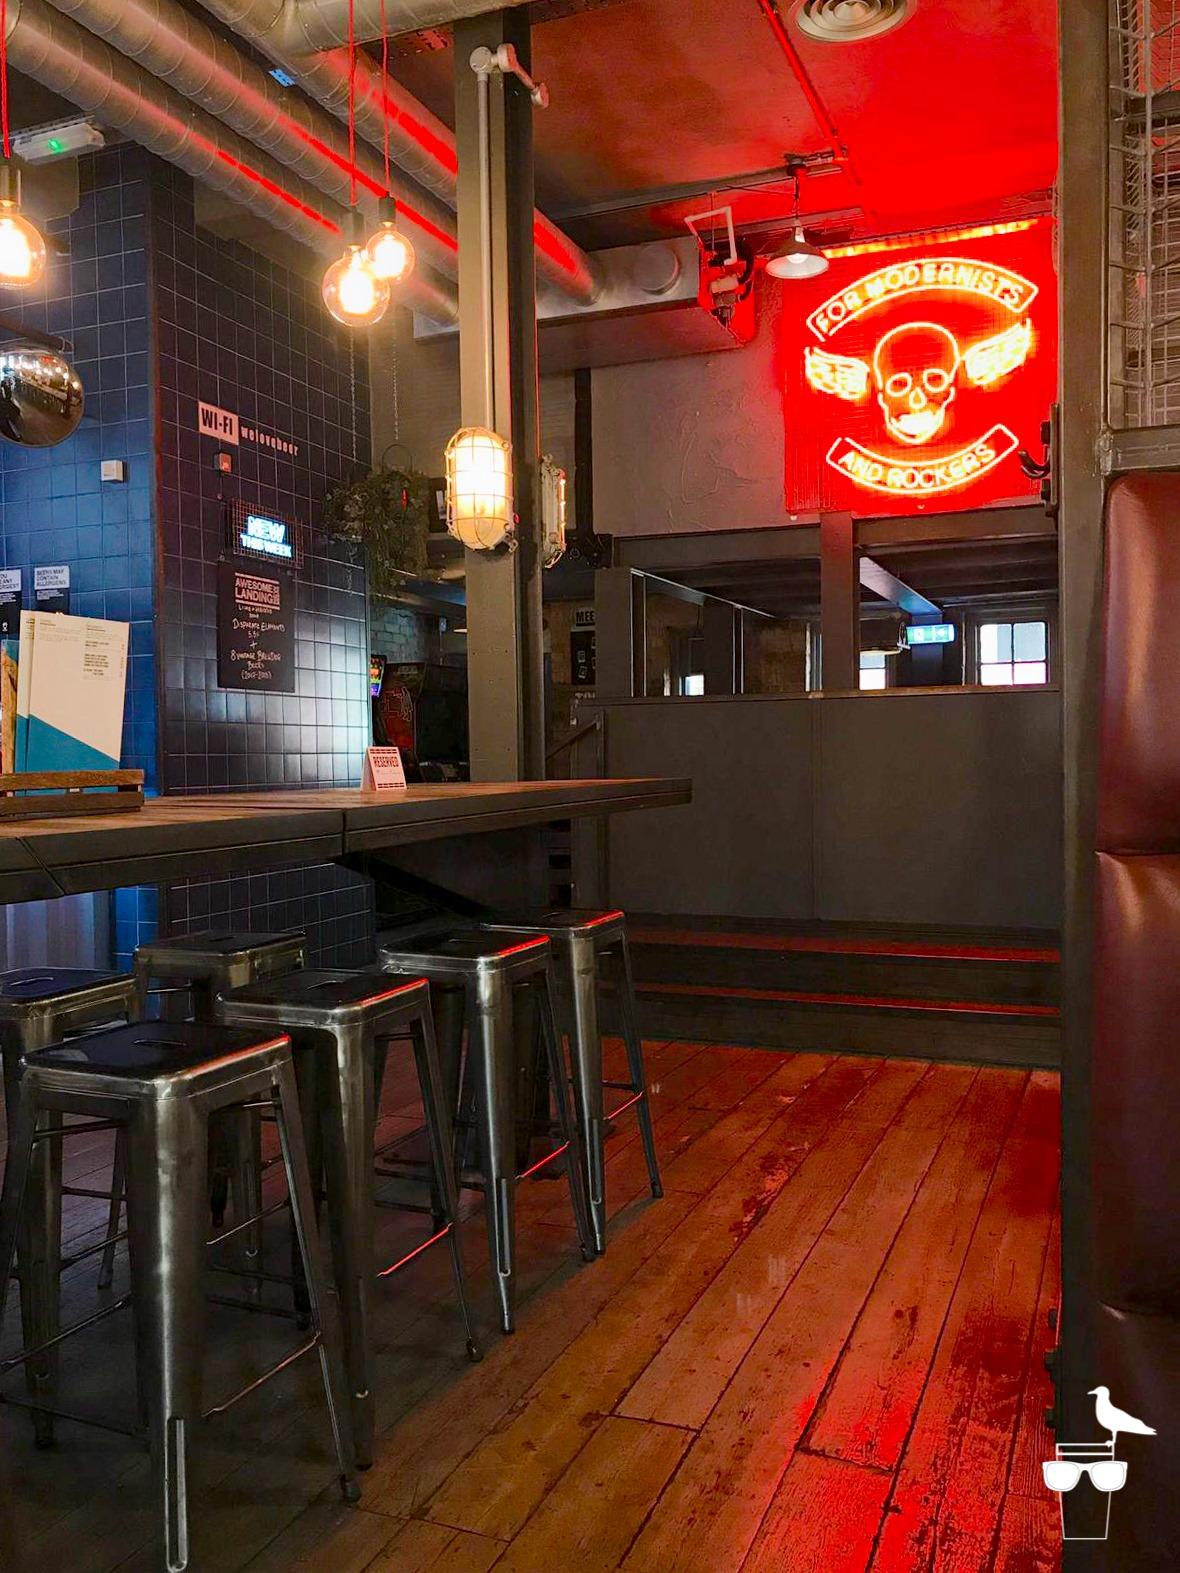 brewdog brighton stools and neon sign